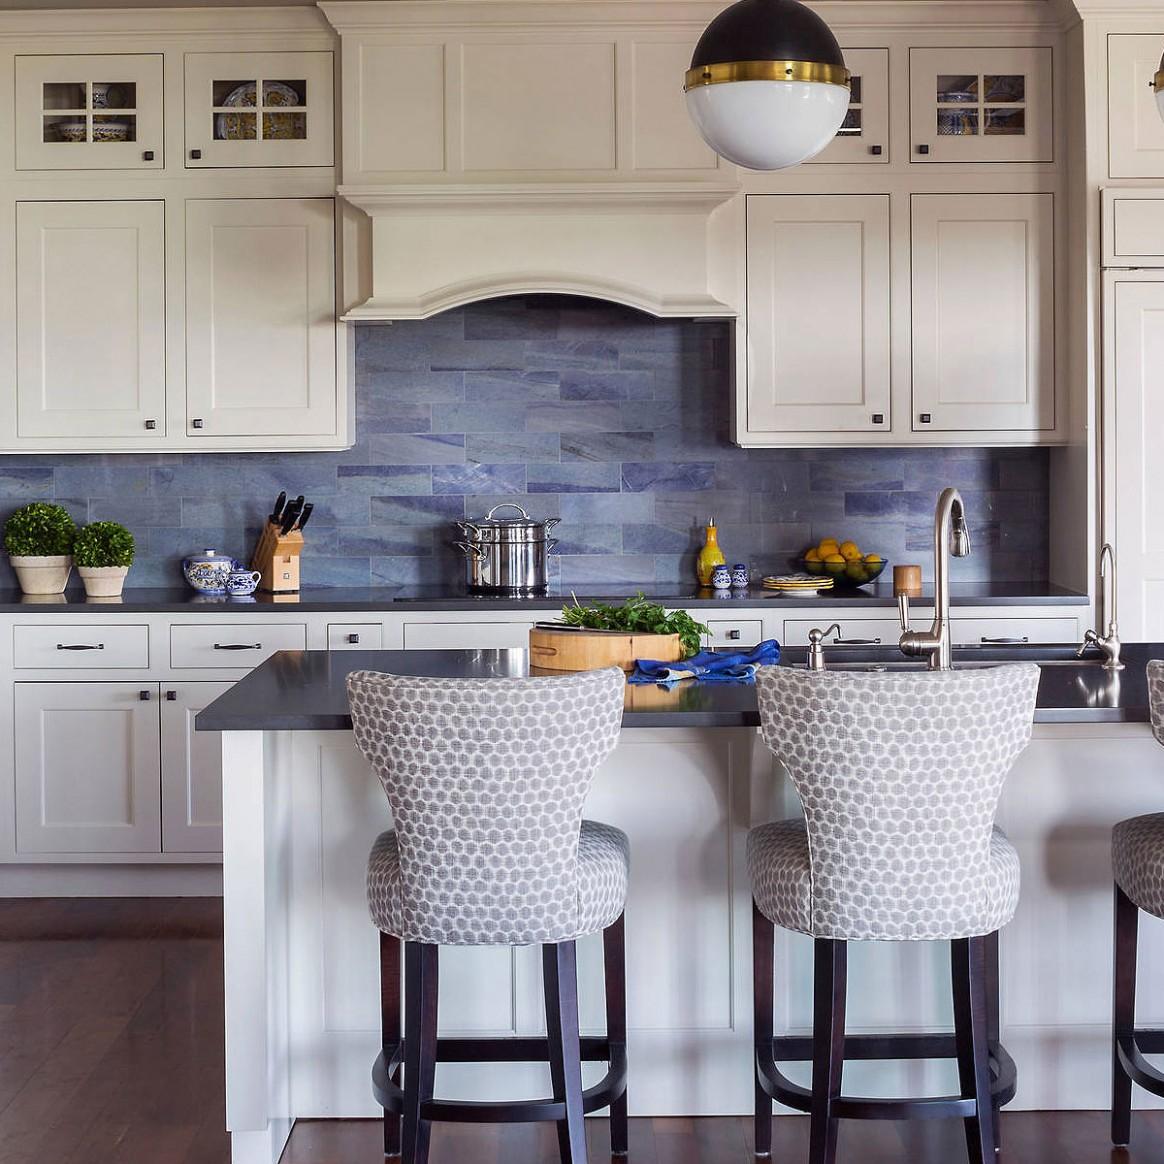 11+ Blue Backsplash Ideas ( Navy, Aqua, Royal or Coastal ) Blue Design - Gray Kitchen Cabinets With Blue Backsplash